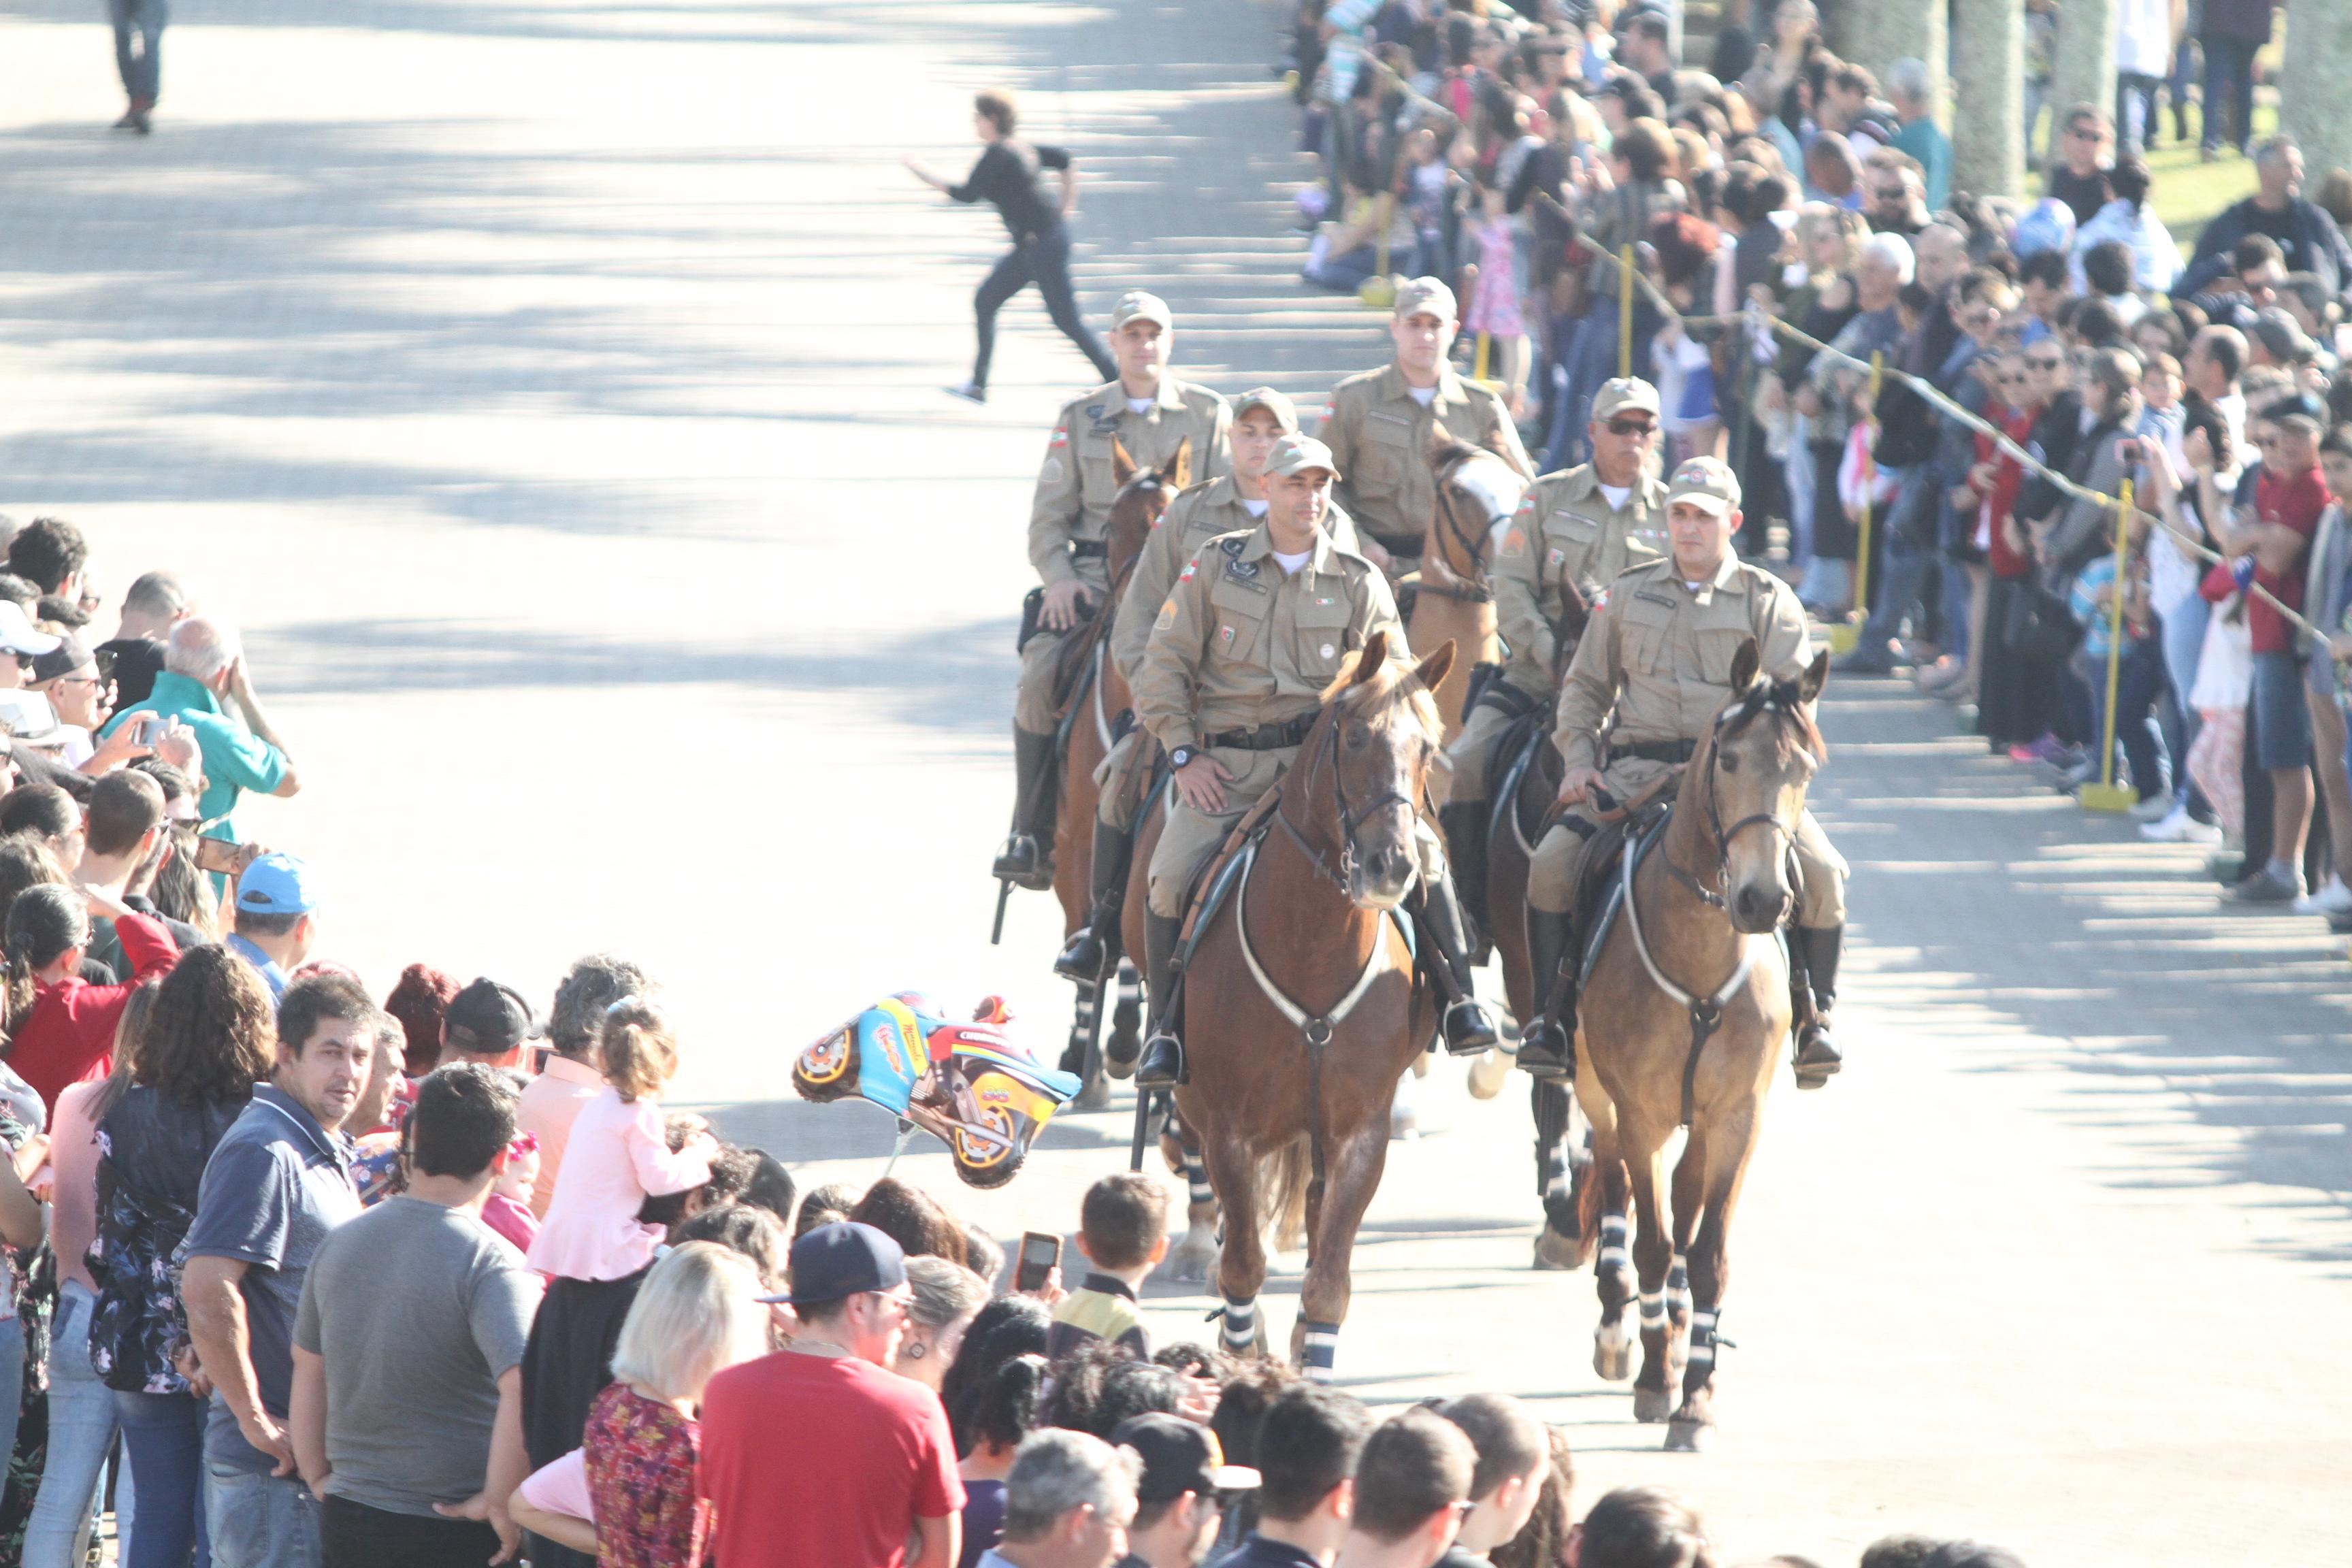 Lucas-Colombo-Desfile-de-7-de-Setembro-Parque-das-Nções-2